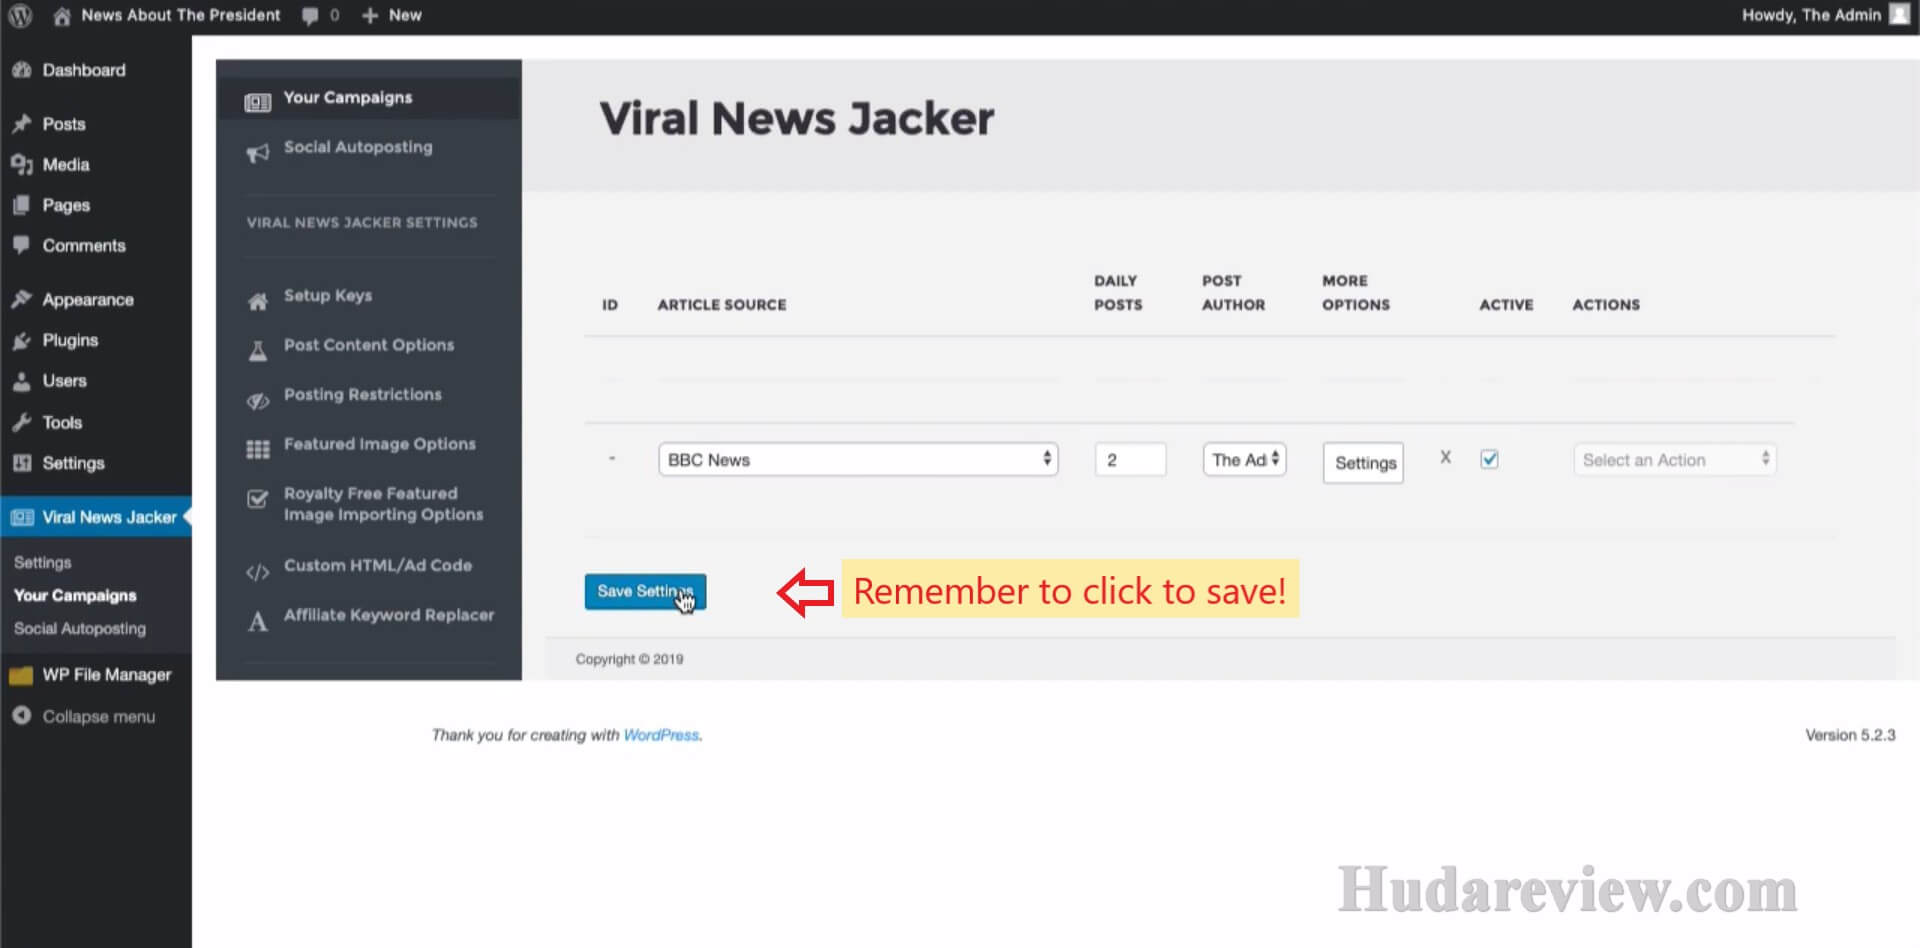 Viral-News-Jacker-Review-Step-5-5